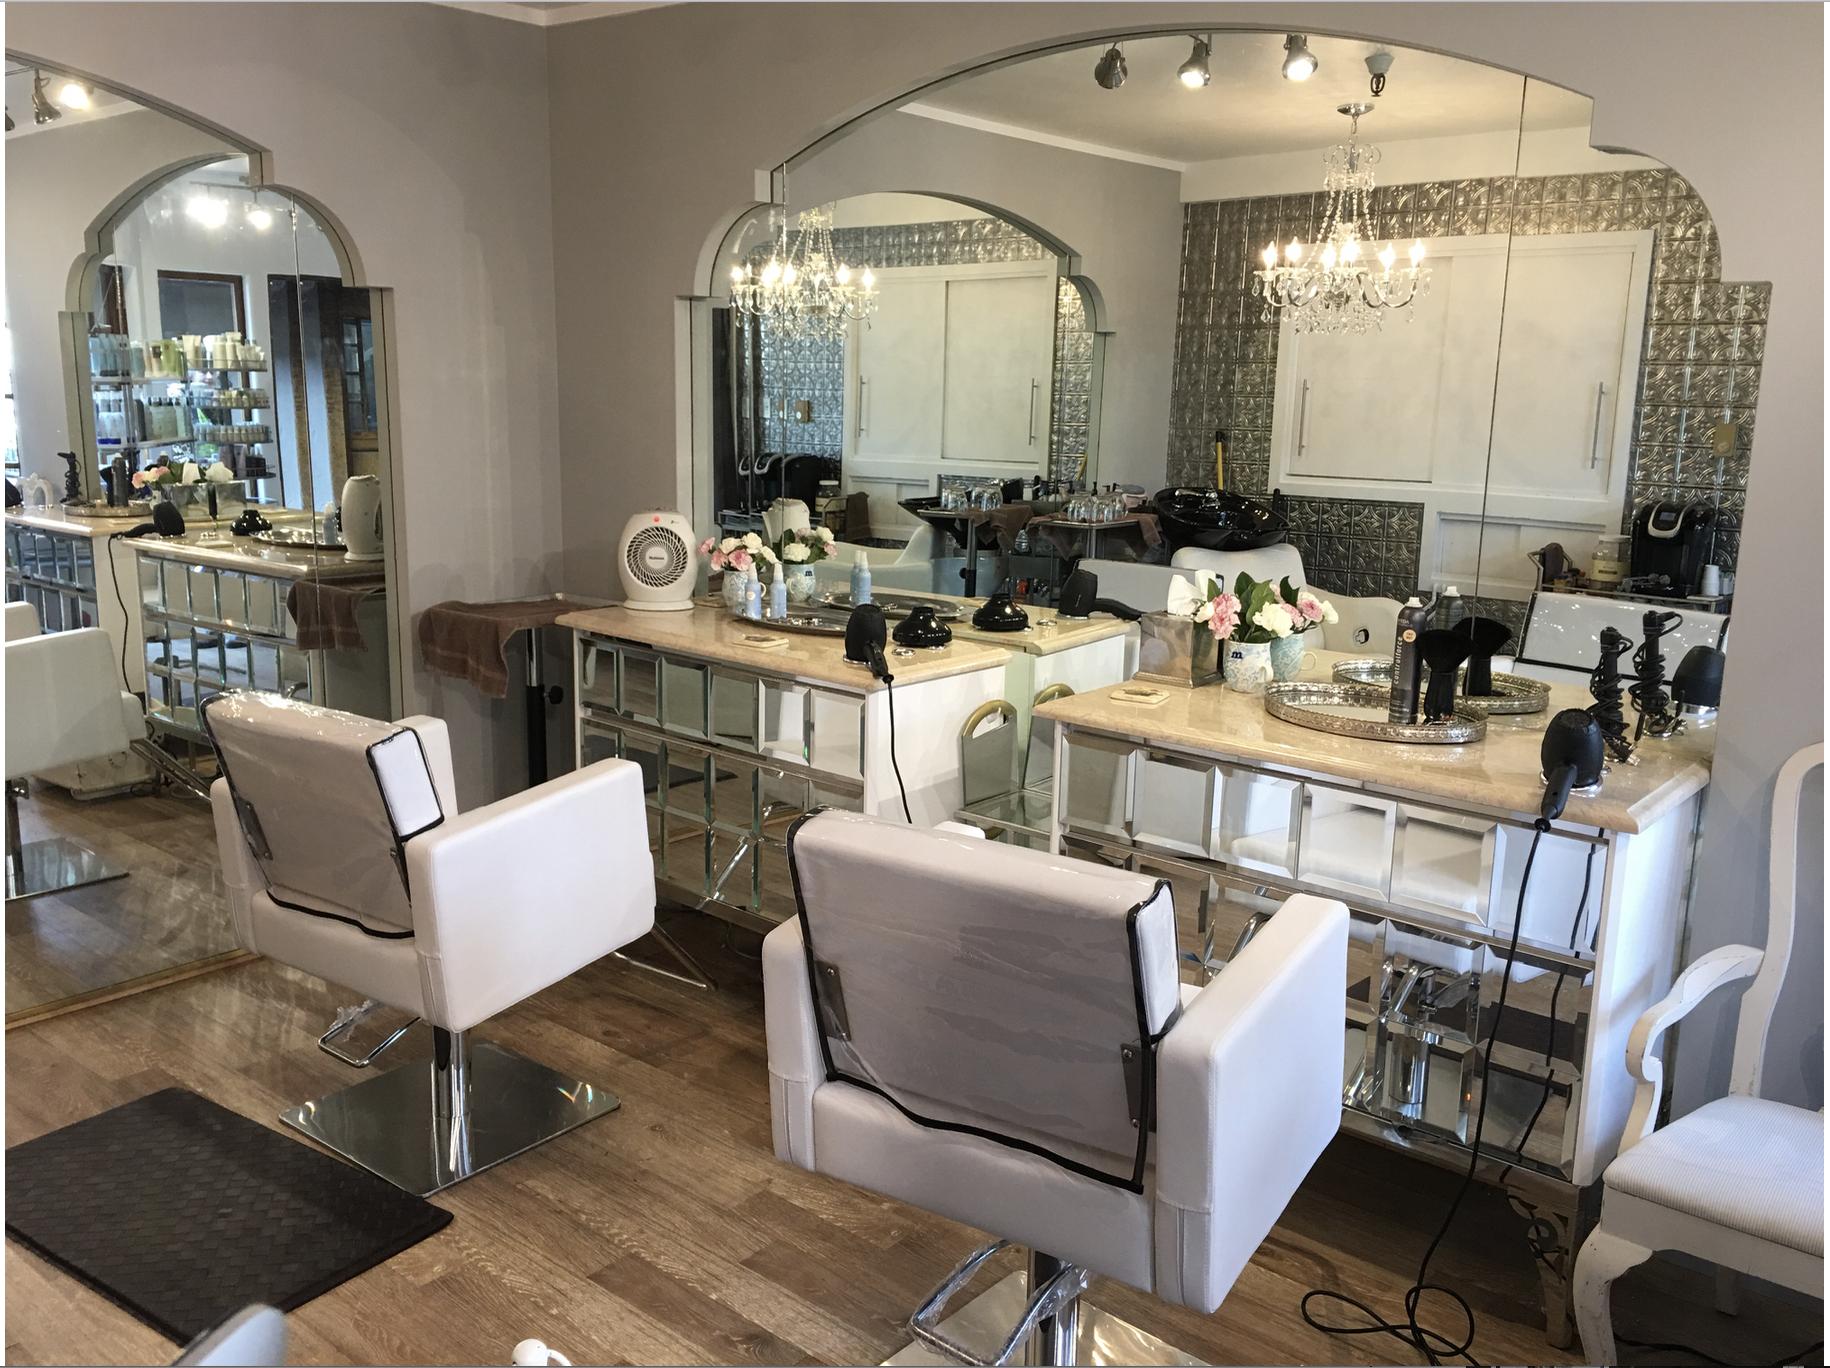 Small Salon Decor Salon suite  Salon suites decor, Salon decor